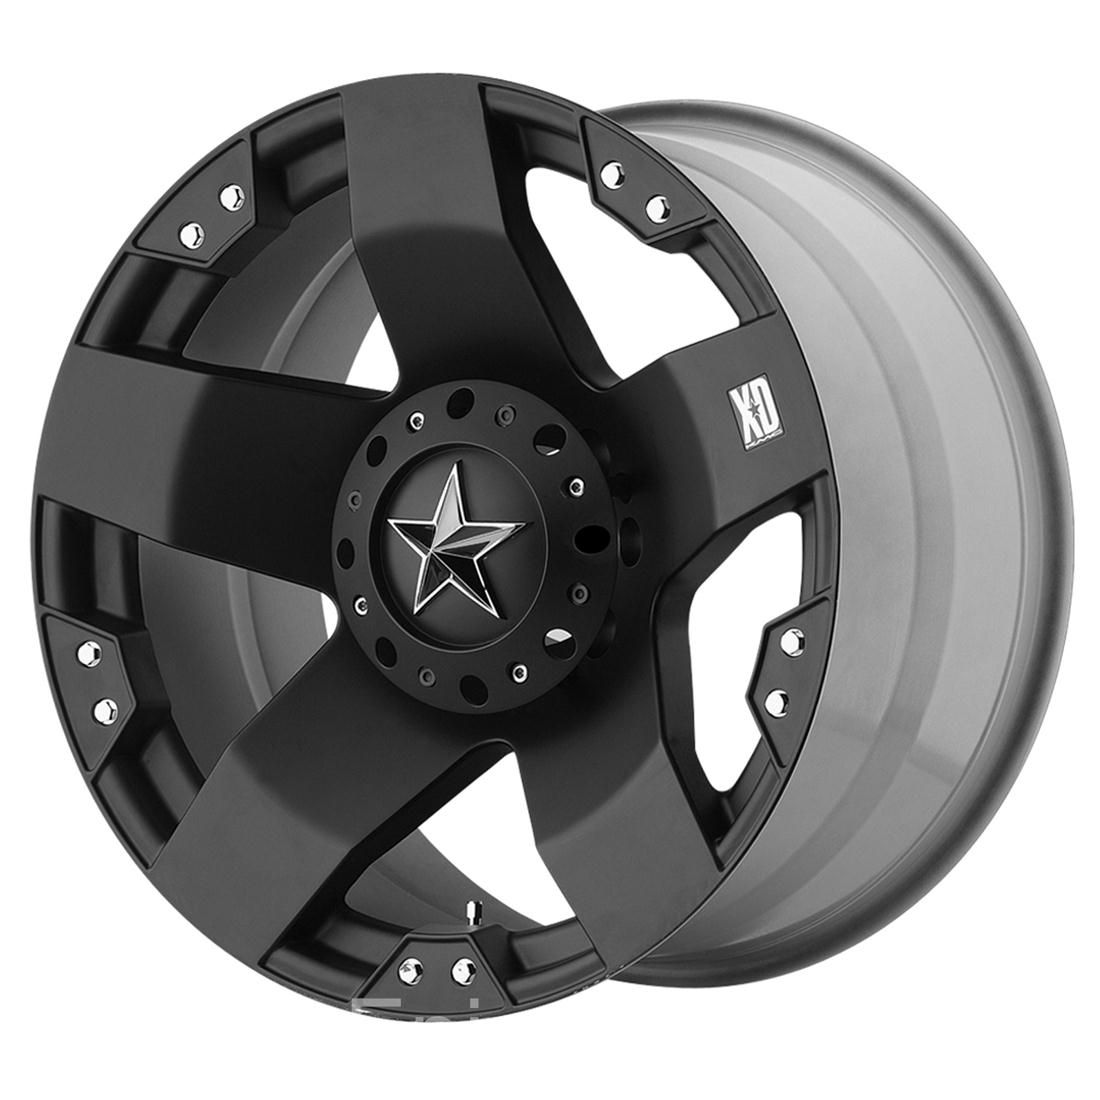 22 Black XD Rockstar Wheels Rim GMC Sierra Chevy Silverado Tahoe 1500